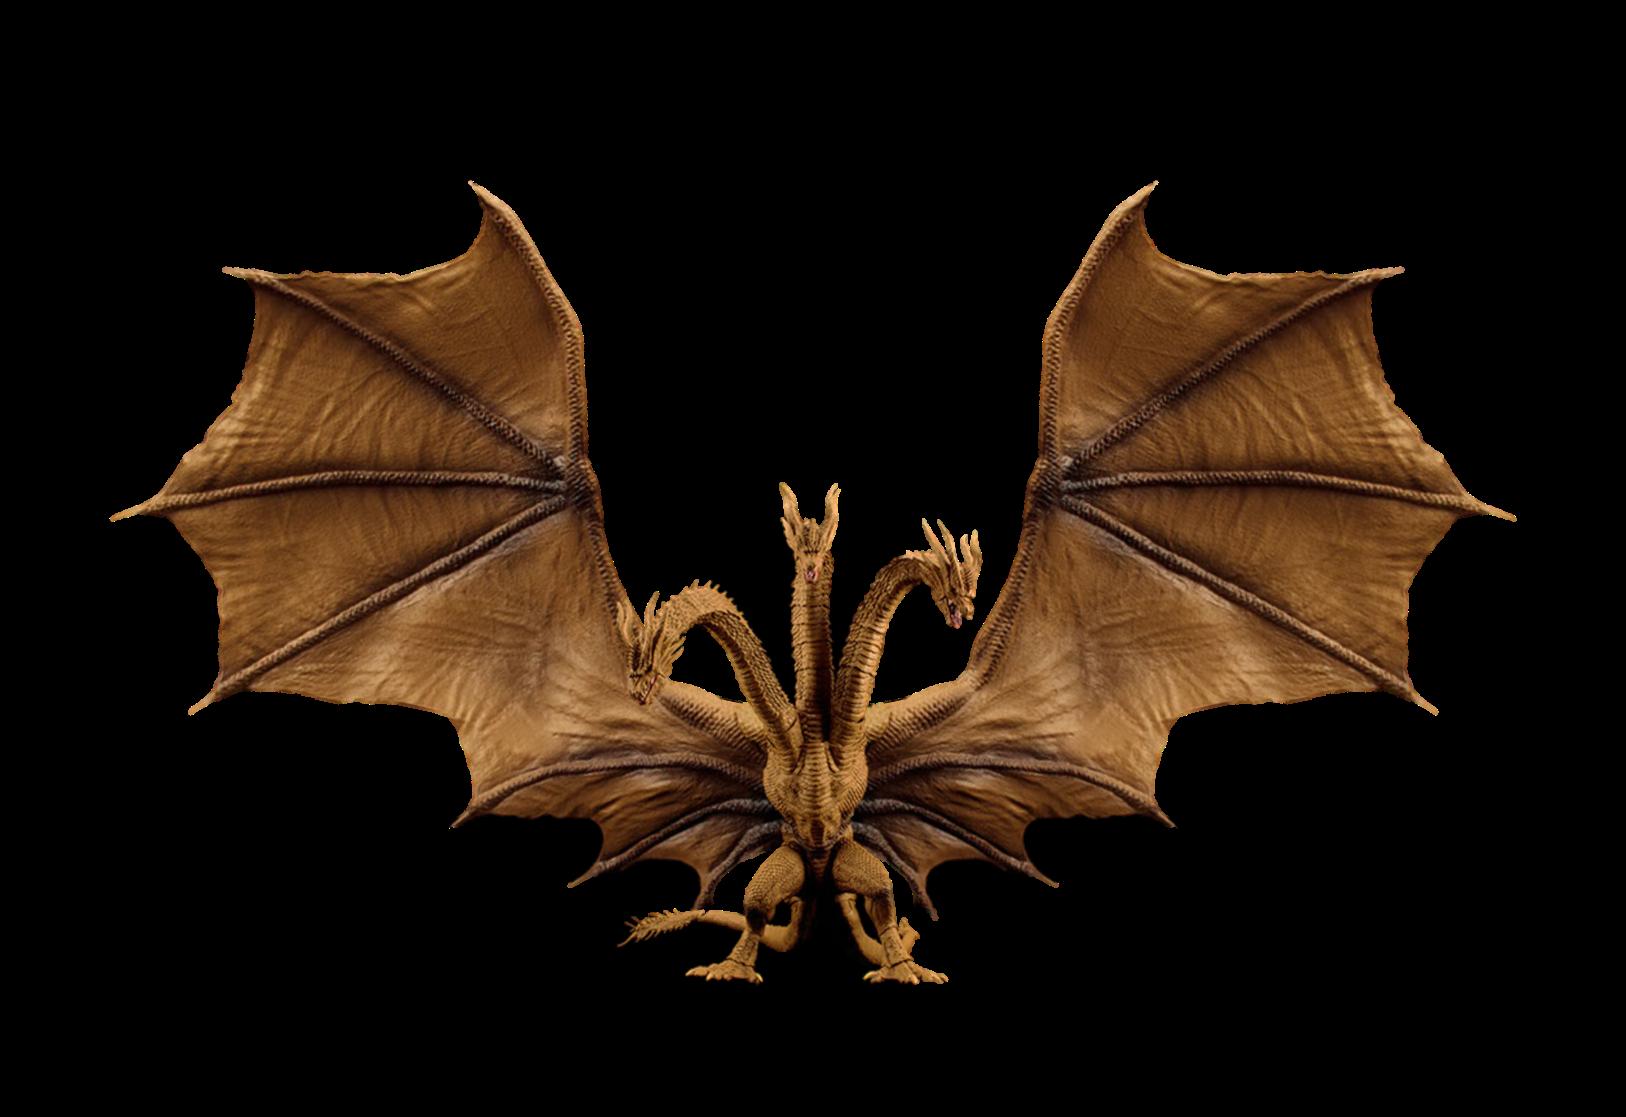 Sh Monsterarts King Ghidorah Transparent By Lincolnlover1865 On Deviantart Sh Monsterarts Interactive Art Transparent